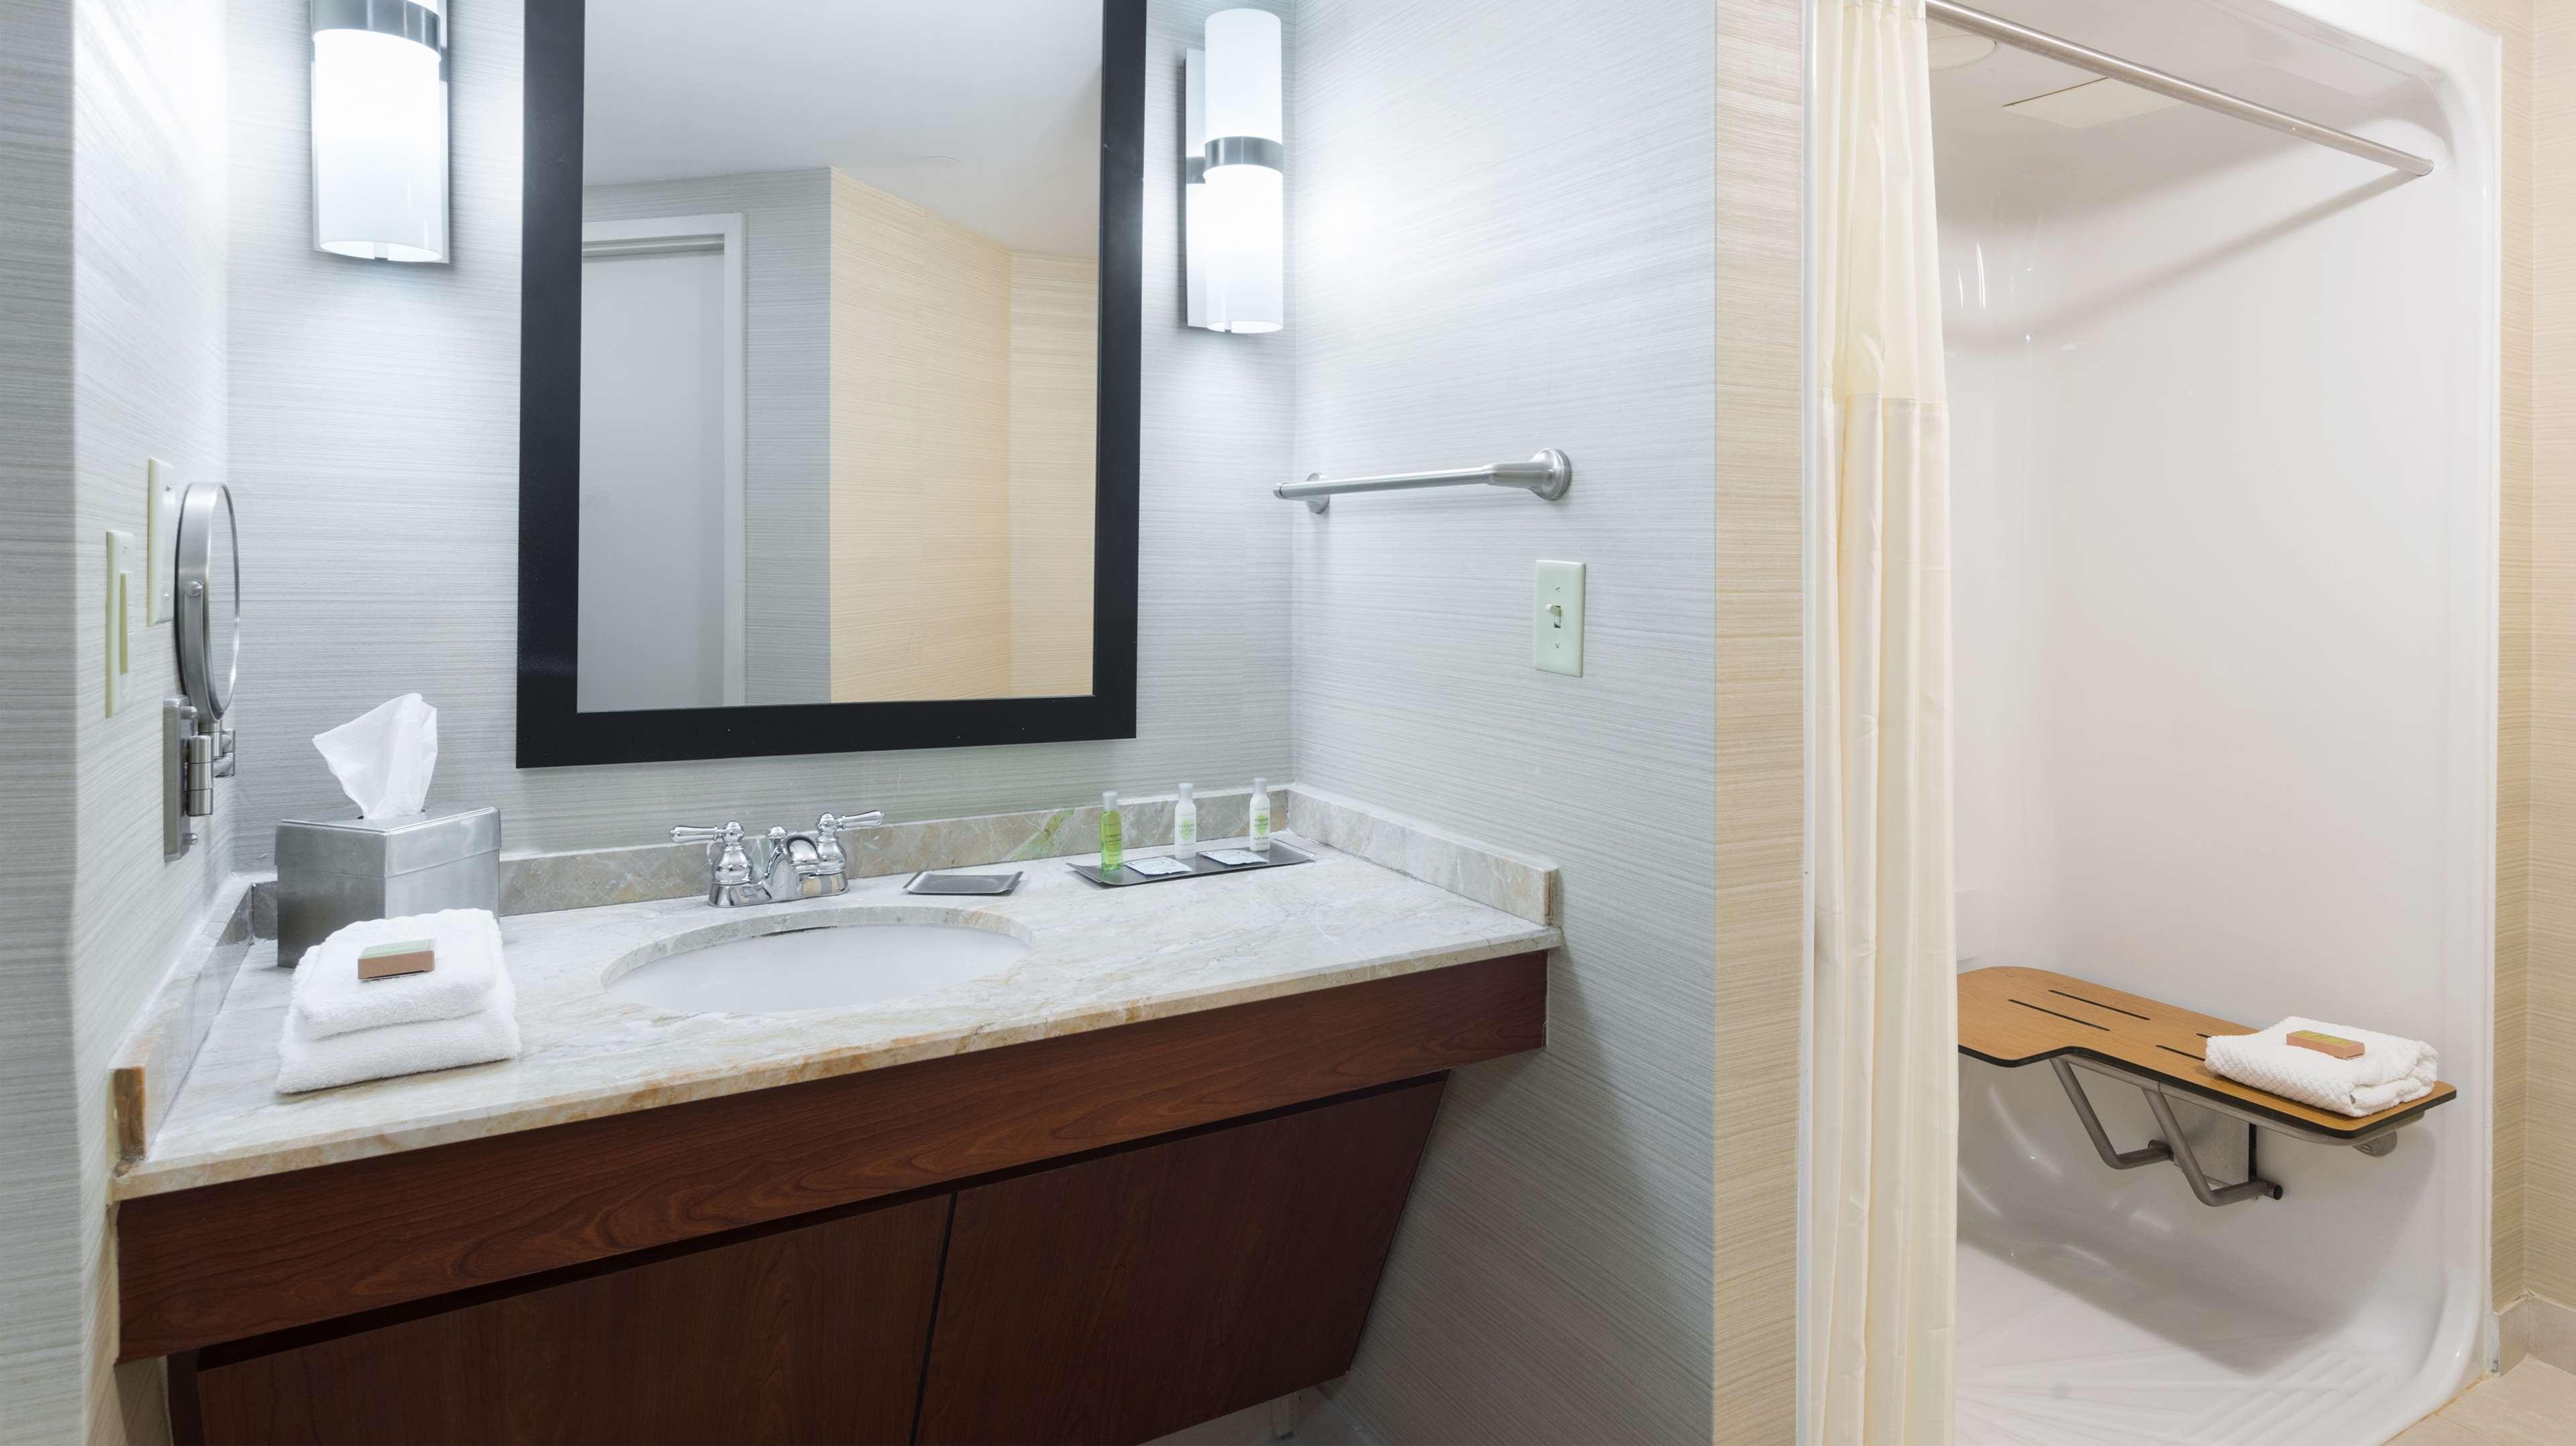 DoubleTree Suites by Hilton Hotel Cincinnati - Blue Ash image 24